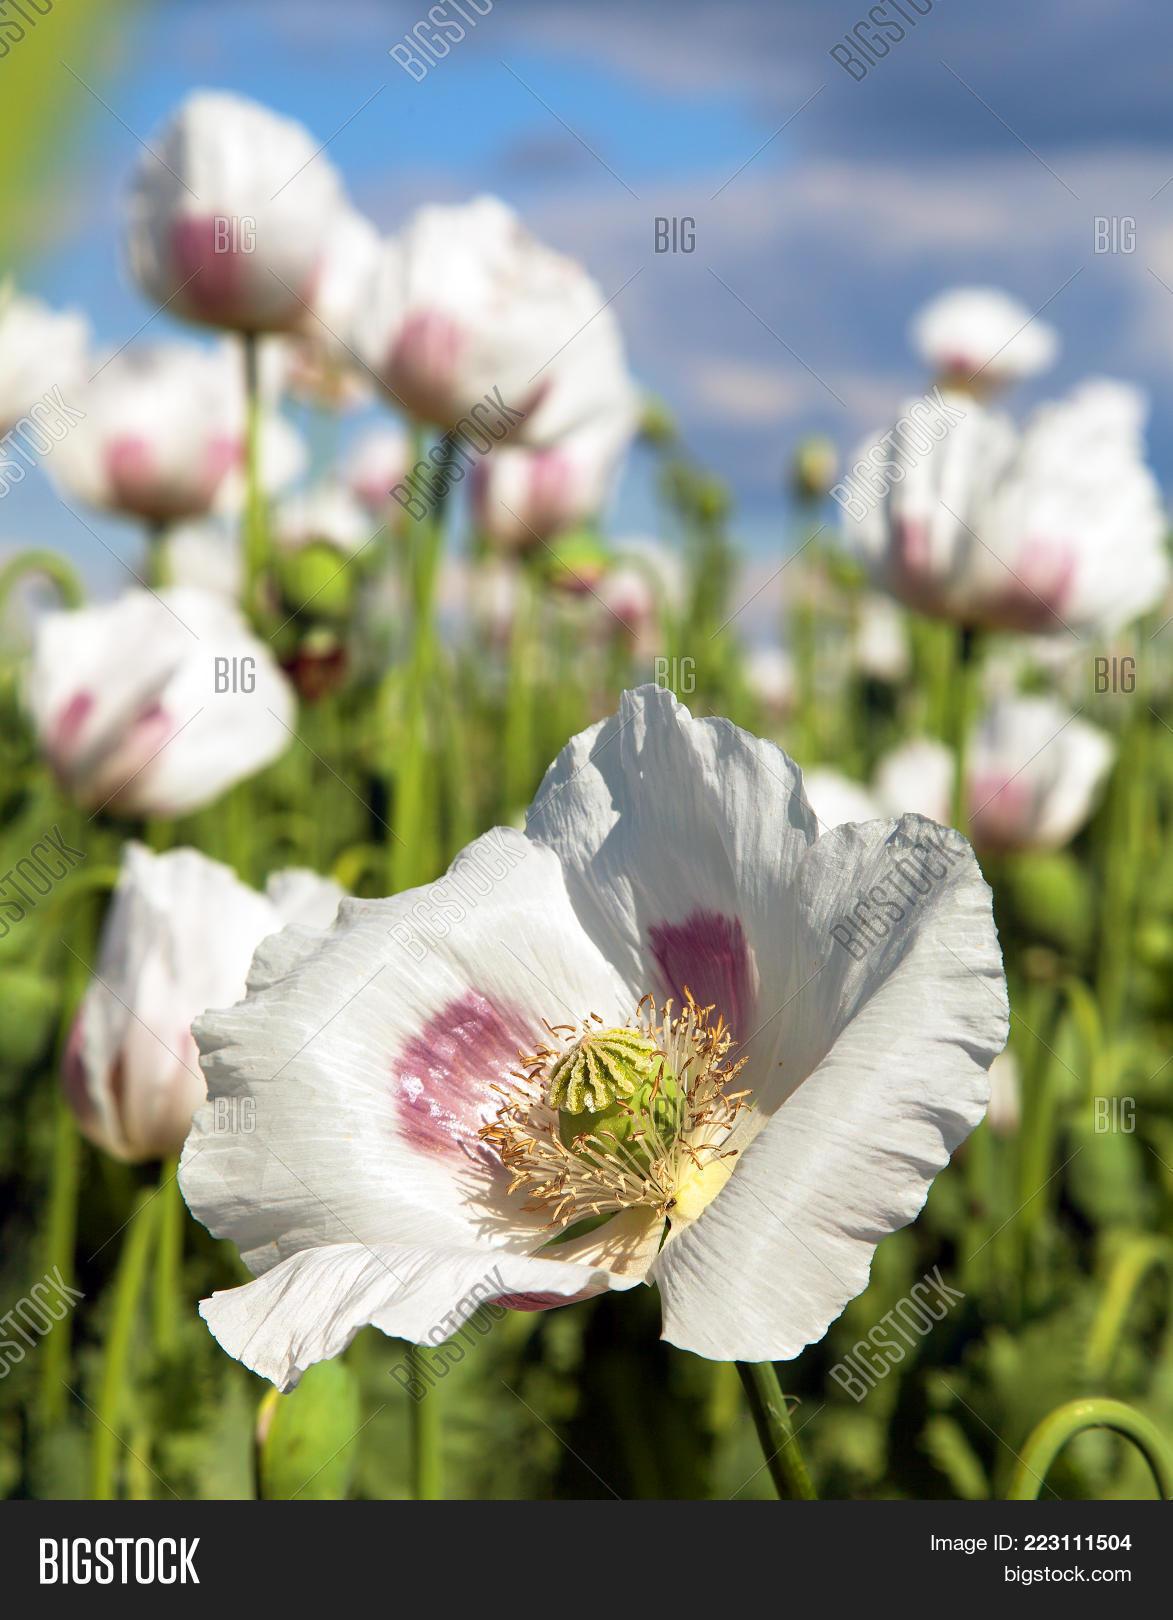 Detail Flowering Opium Image Photo Free Trial Bigstock